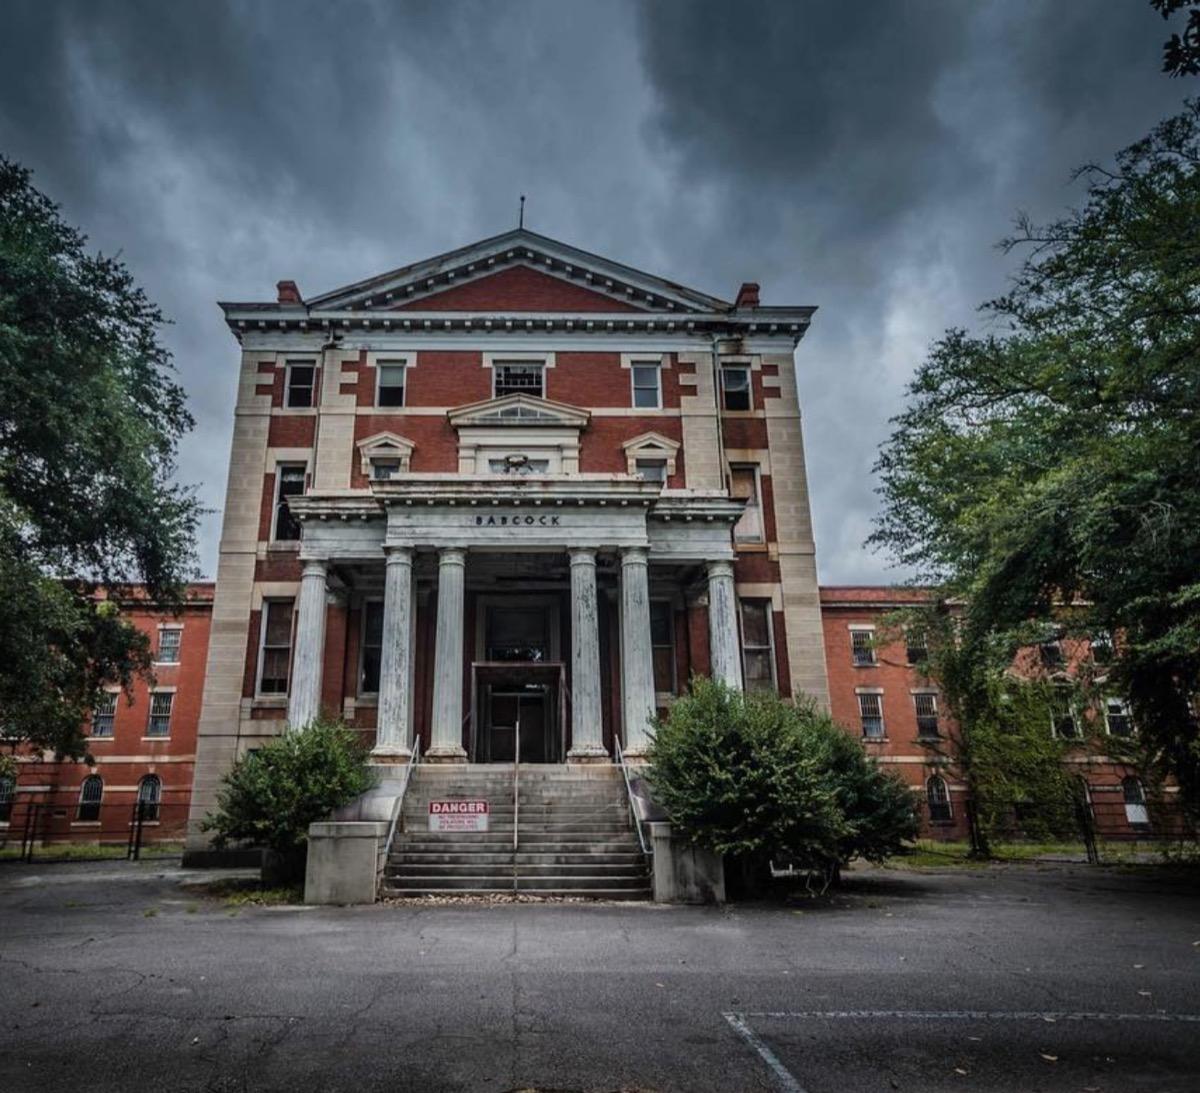 The Babcock Asylum